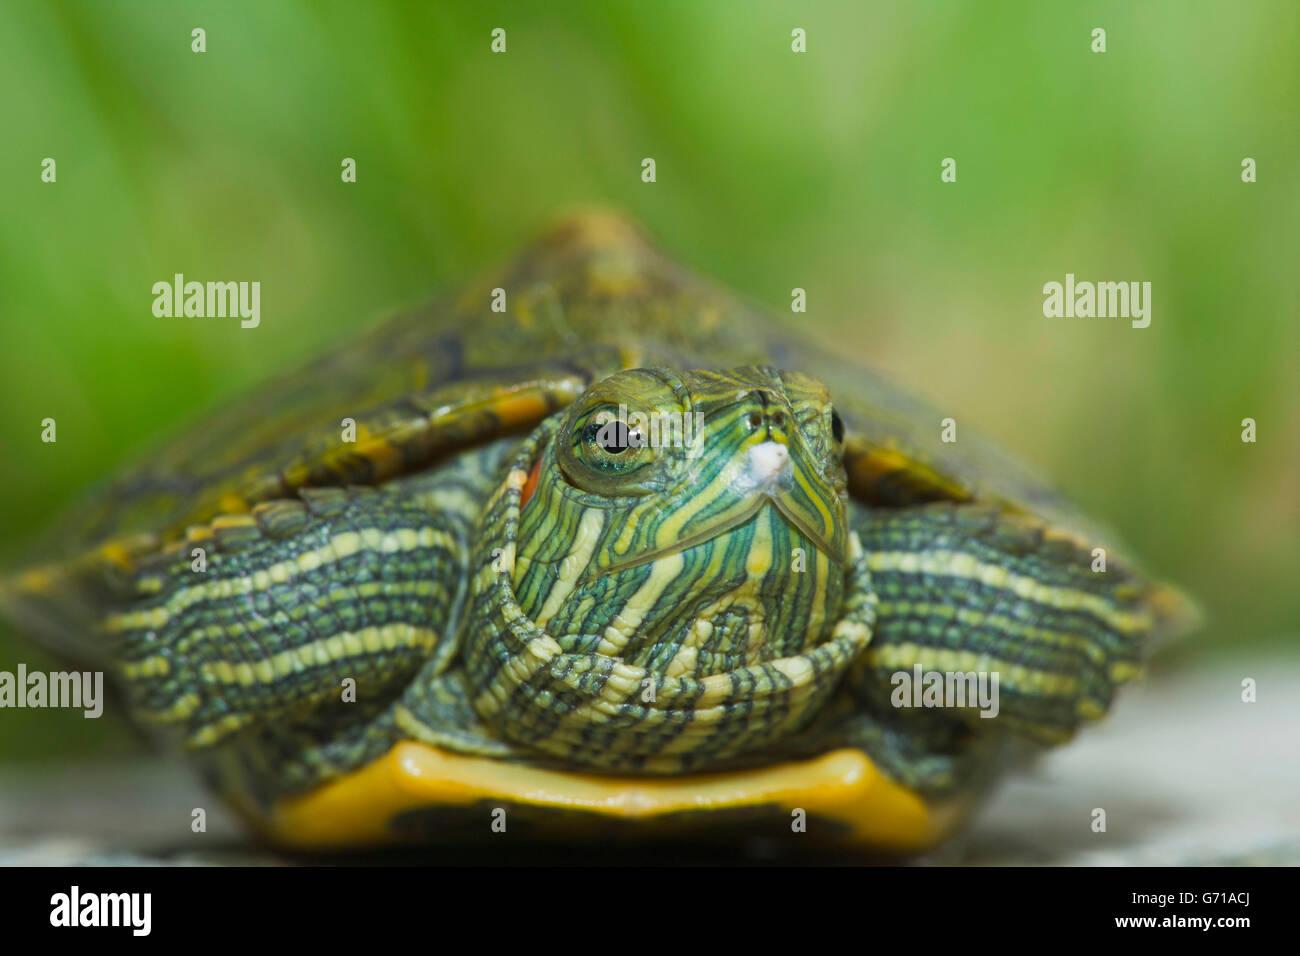 Rosso-eared tartaruga, hatchling, 12 giorni, con uovo dente / (Trachemys scripta elegans, Pseudemys scripta elegans) Immagini Stock